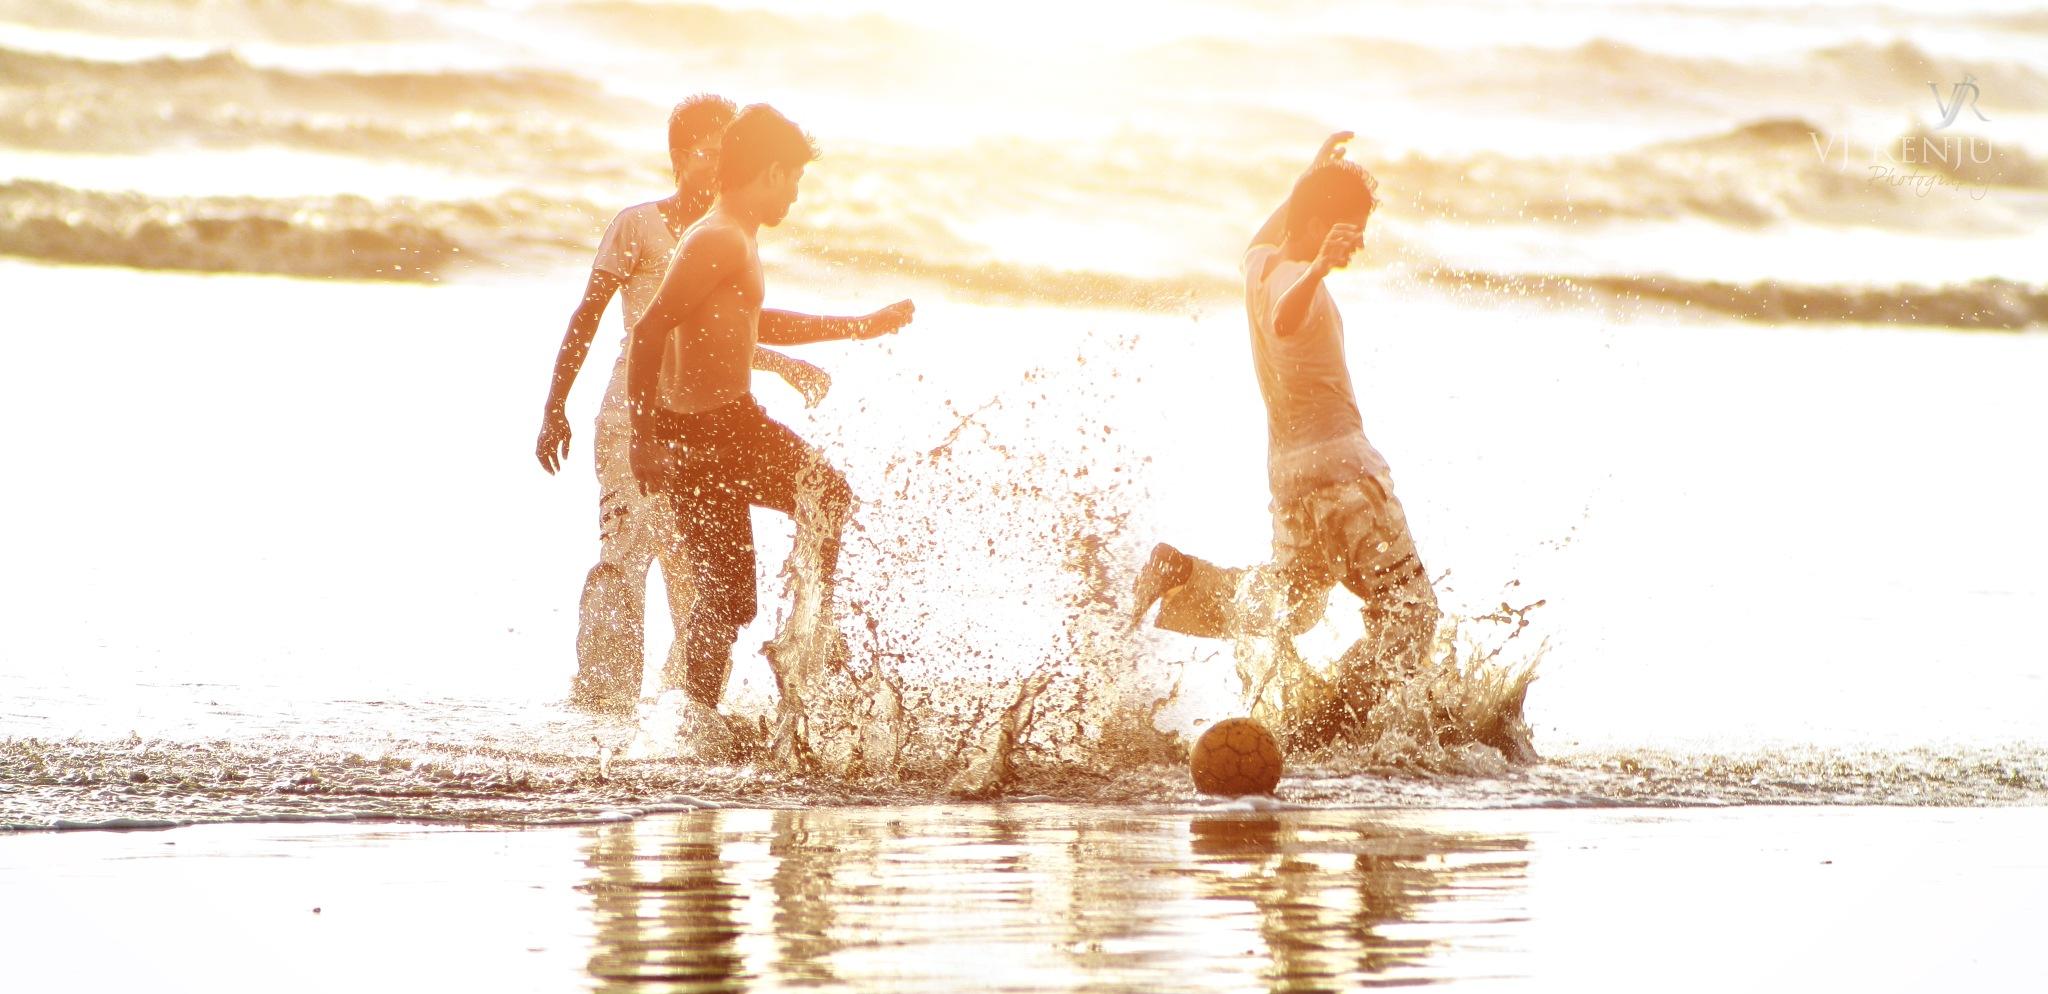 Let's Football by VJ Renju